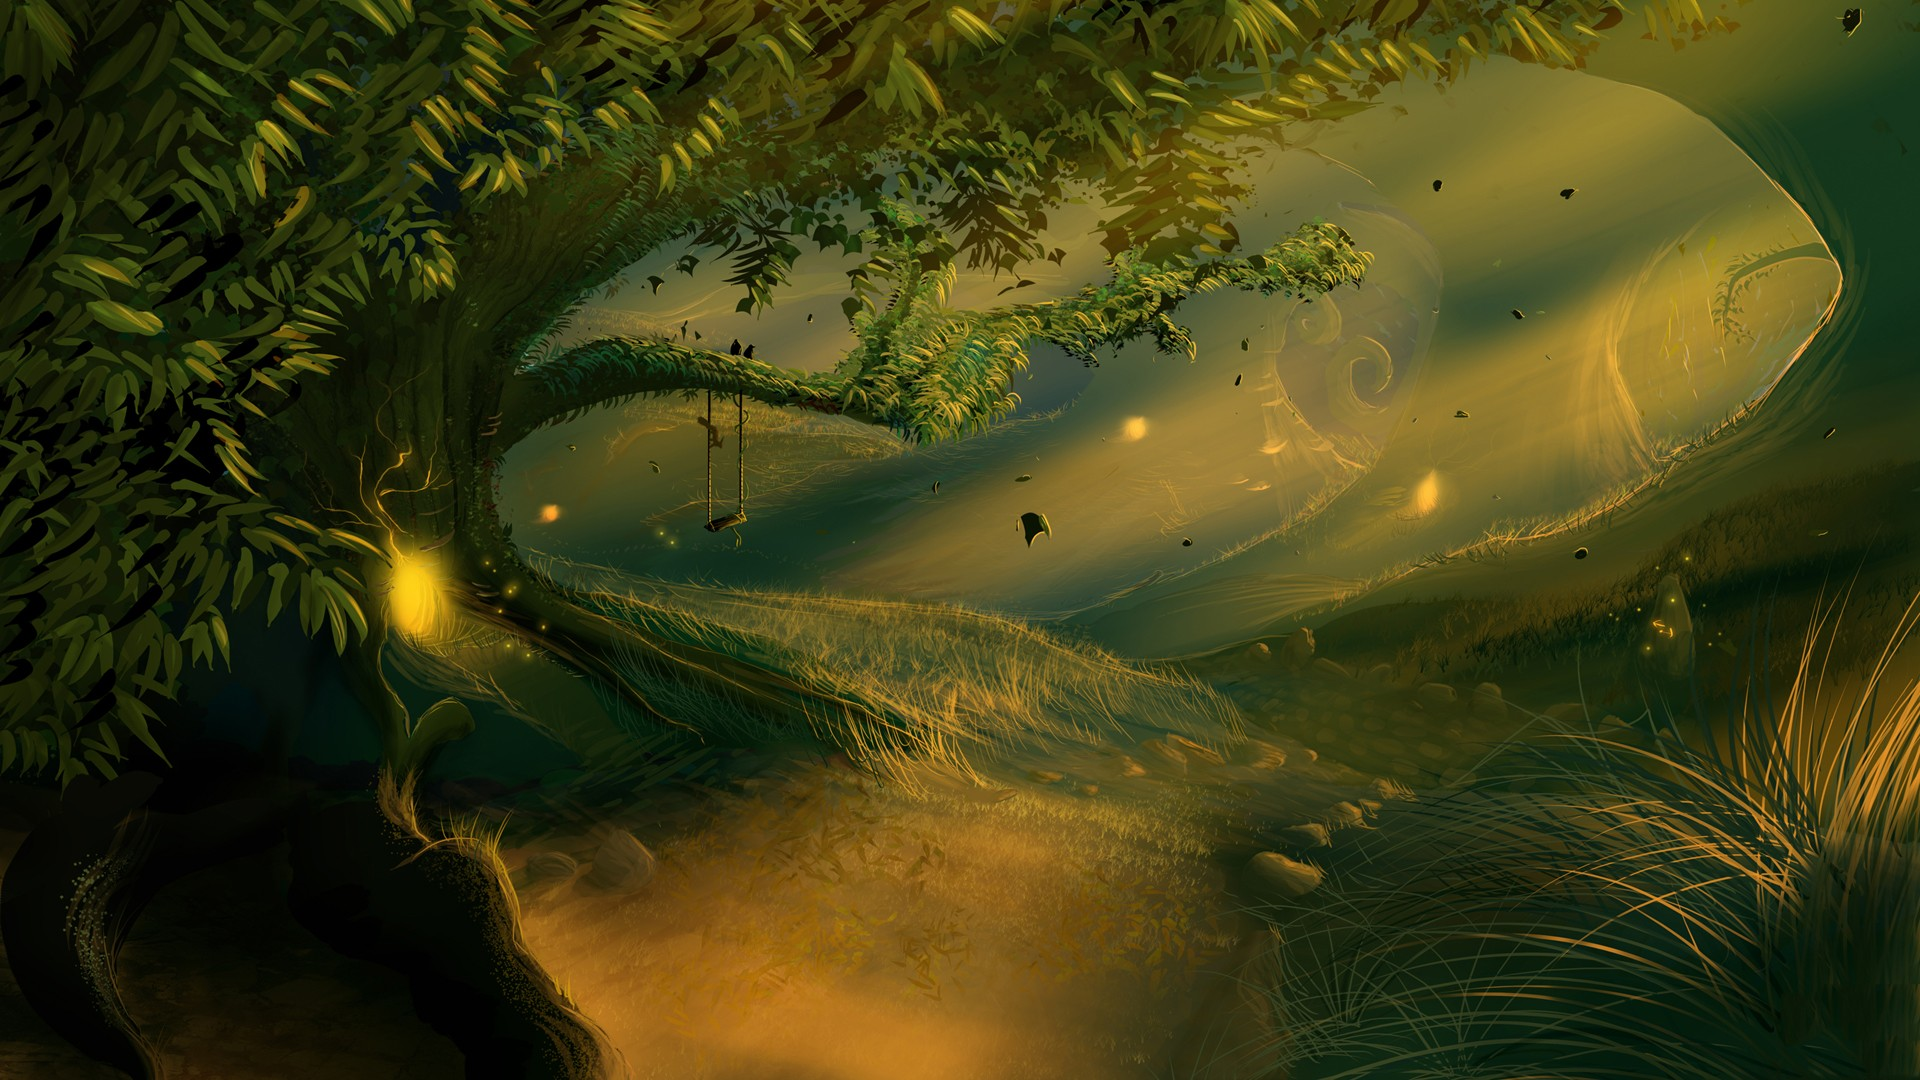 General 1920x1080 forest fantasy art swings sunlight trees